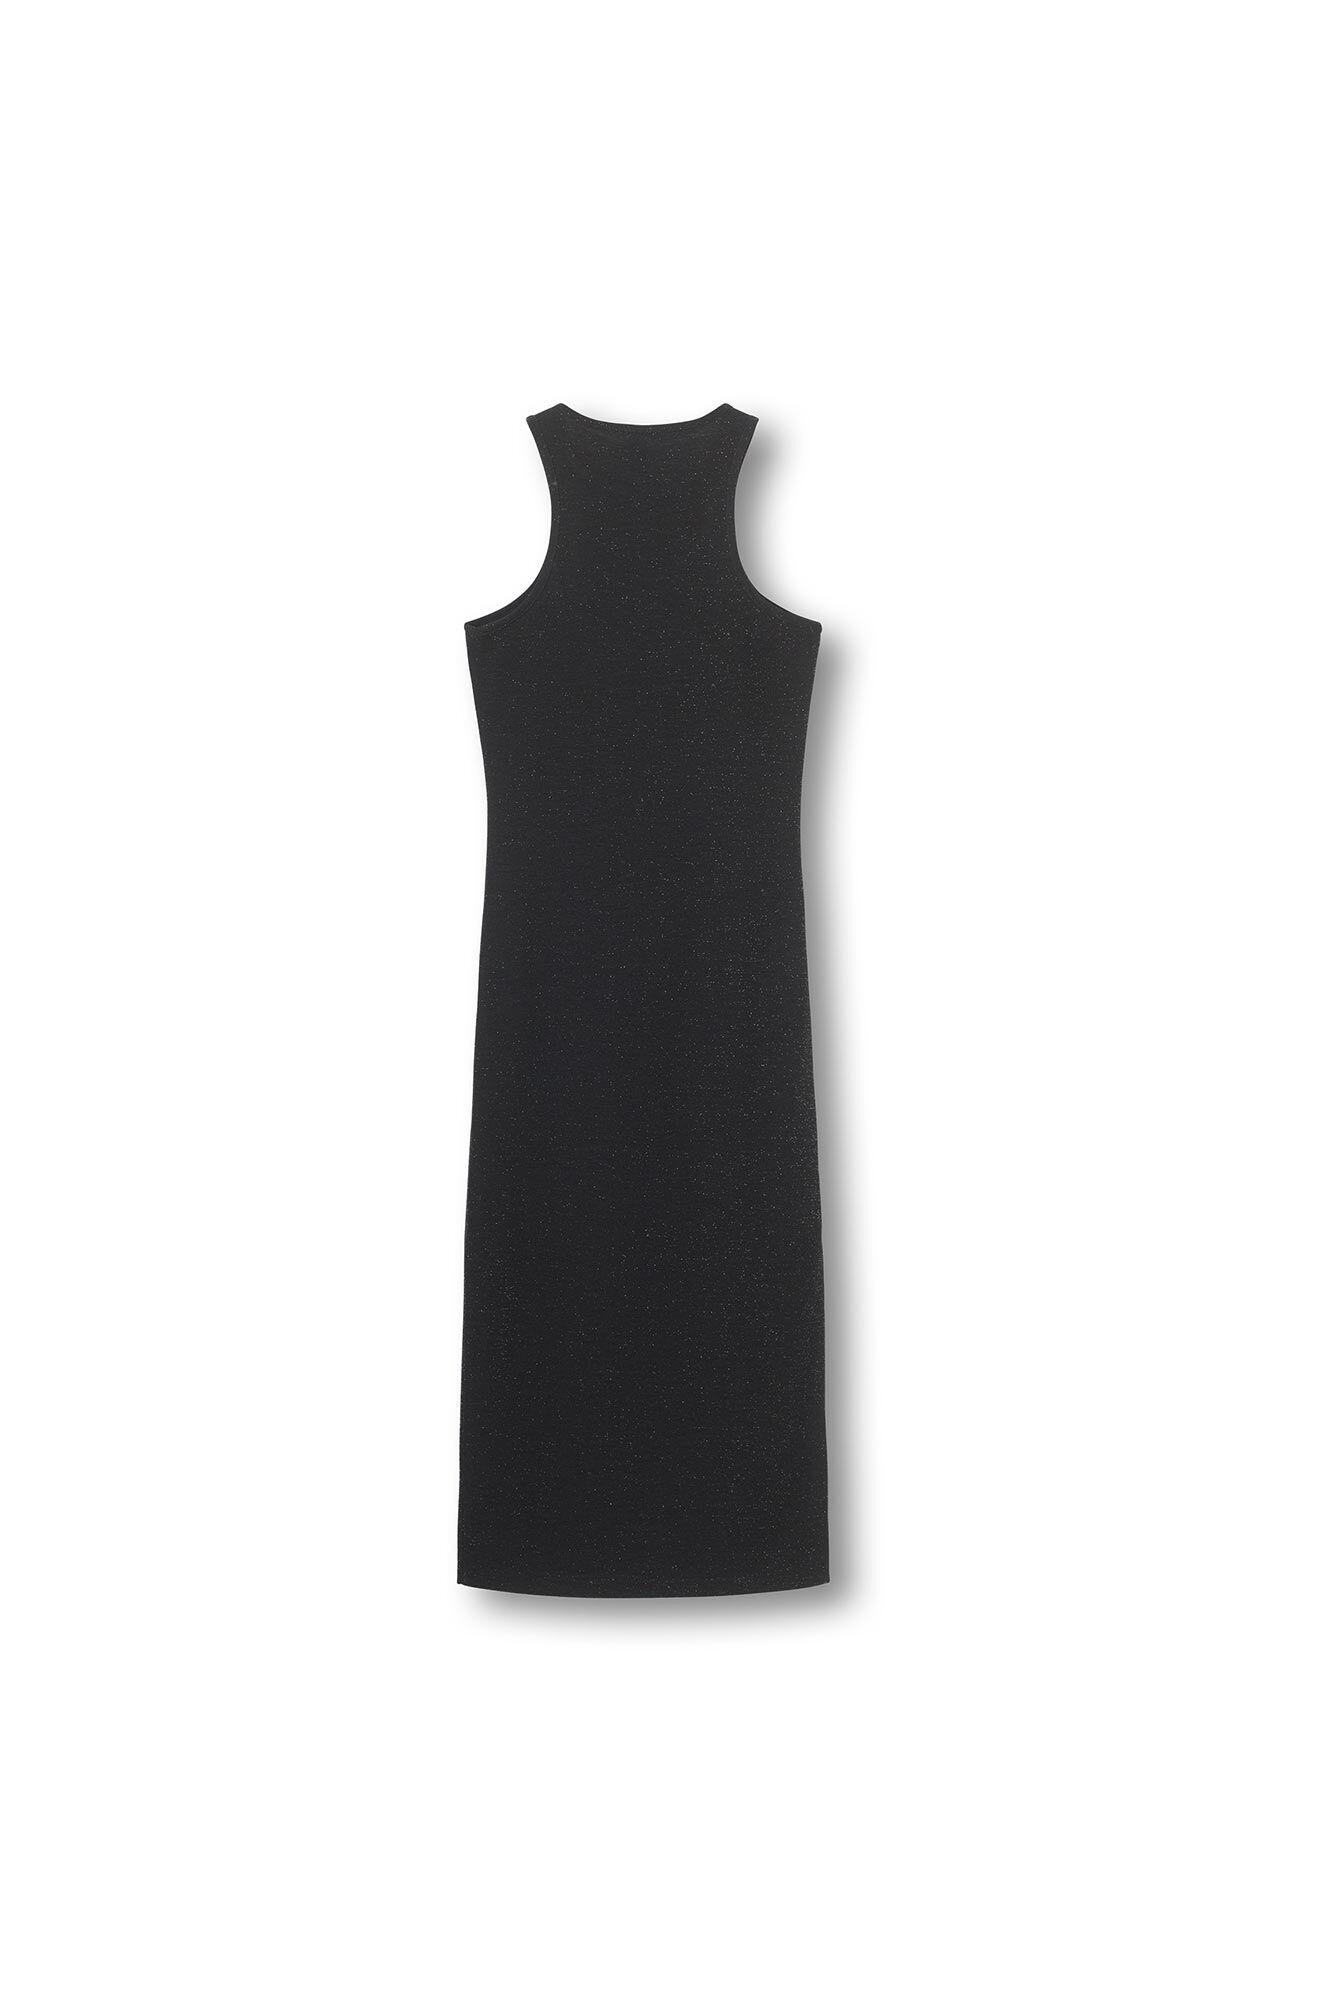 Ronni dress 07770447, BLACK